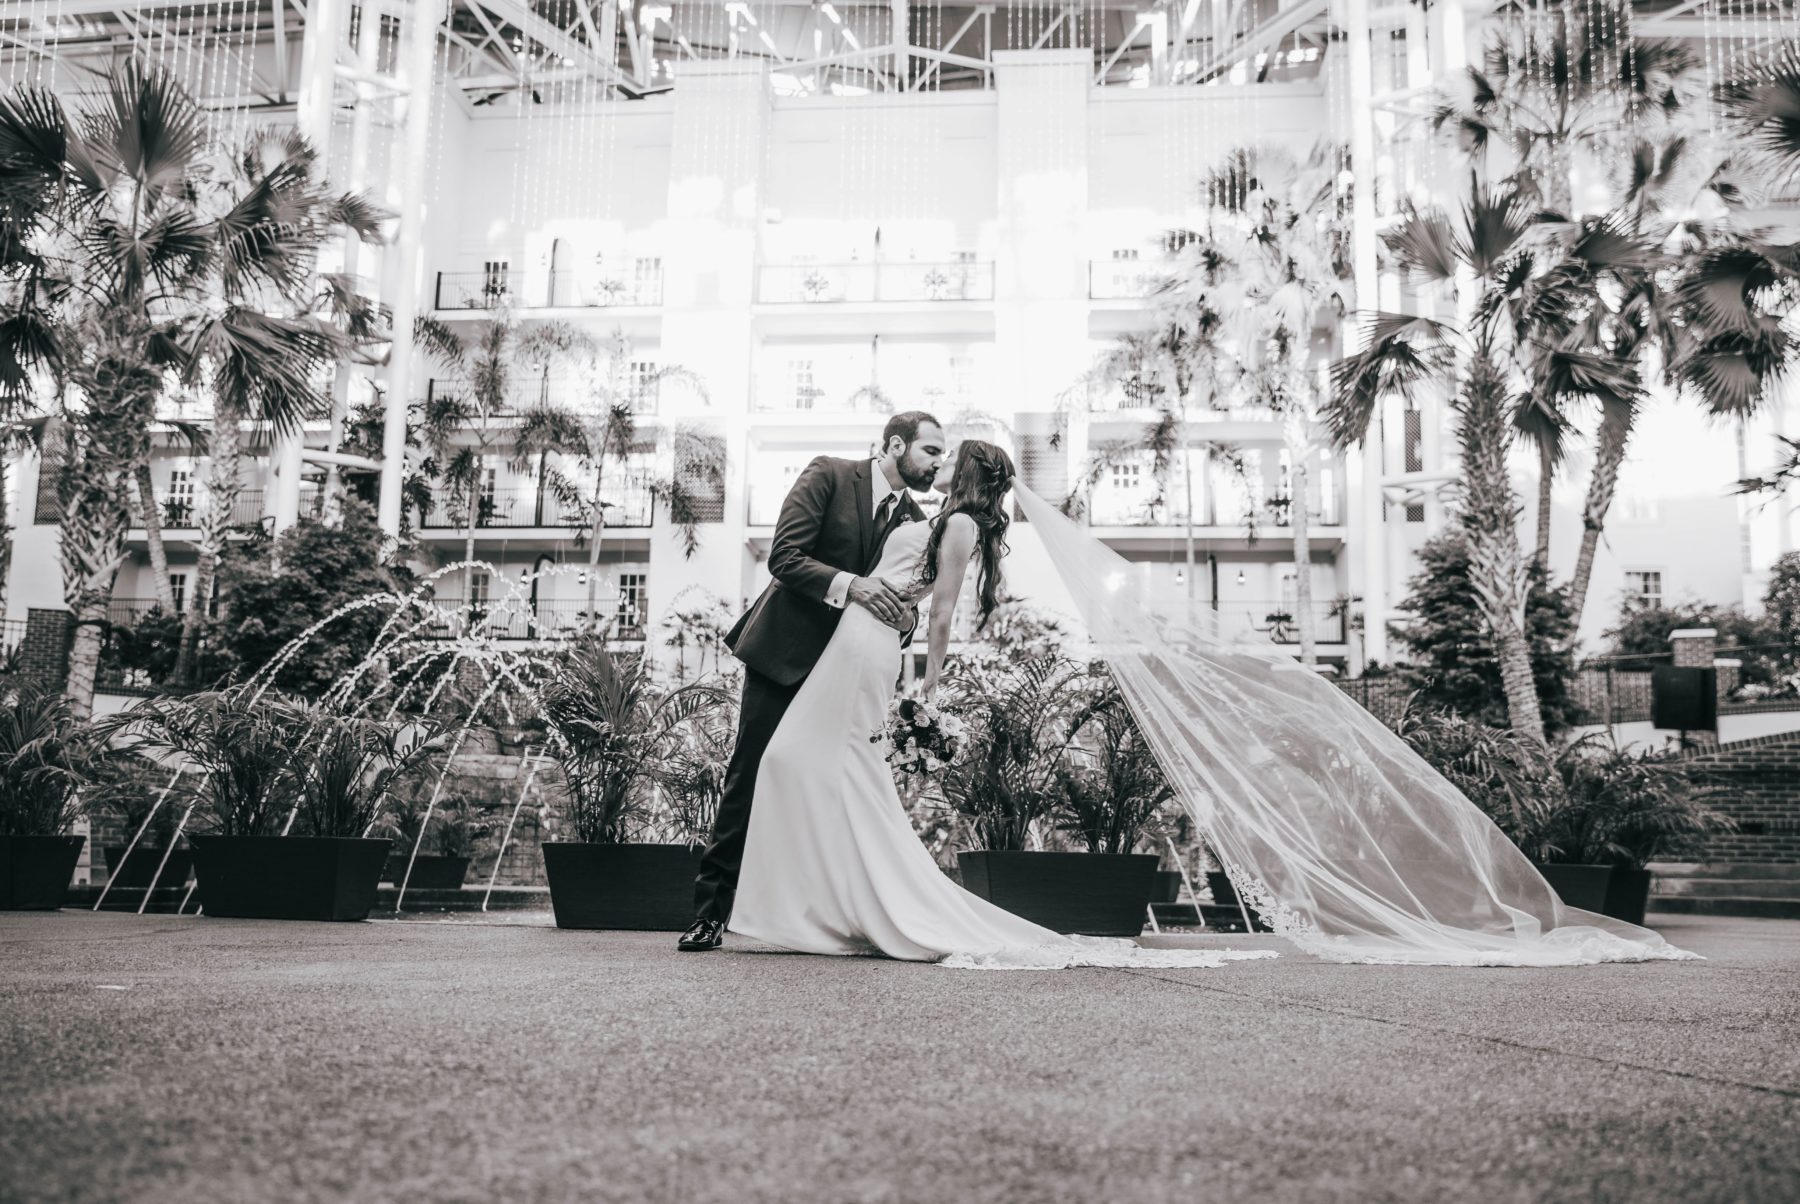 Grace Upon Grace Wedding Photography